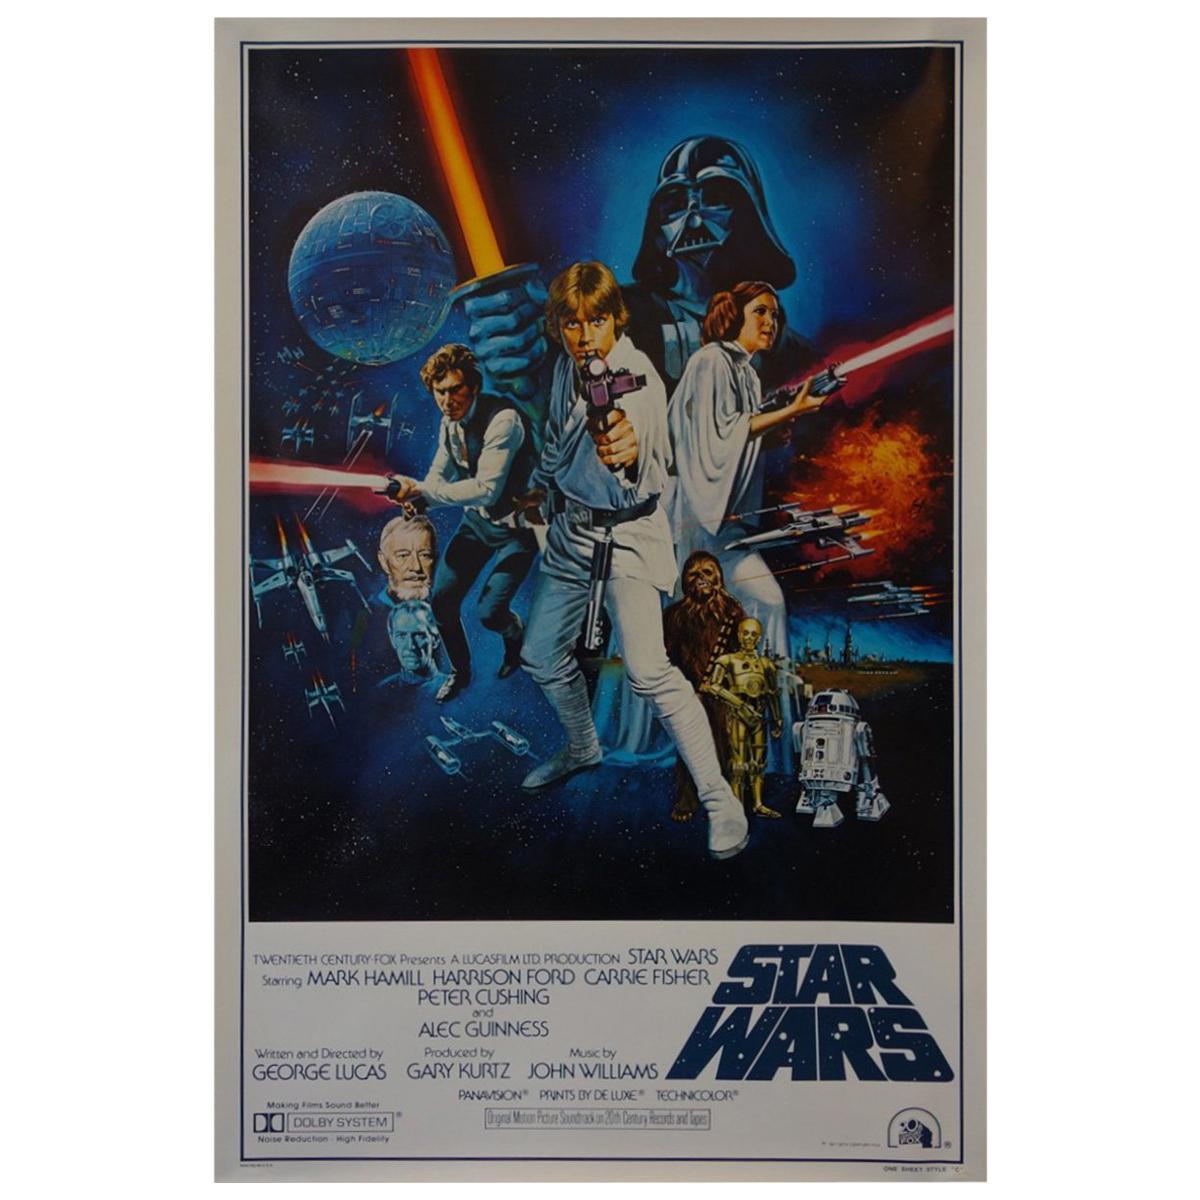 Star Wars, Poster, 1977